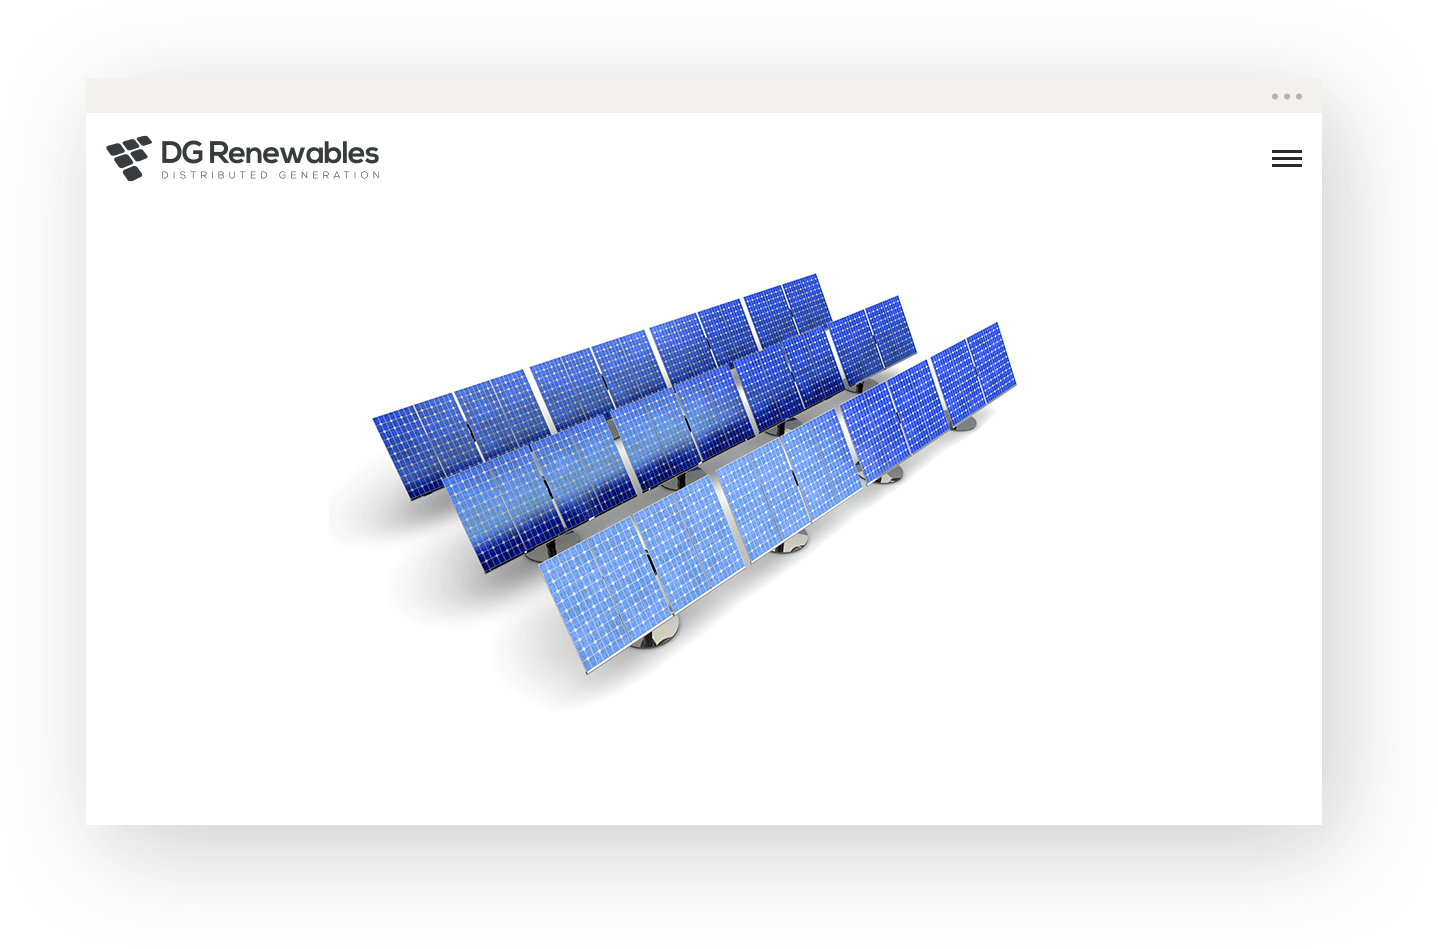 DG Renewables